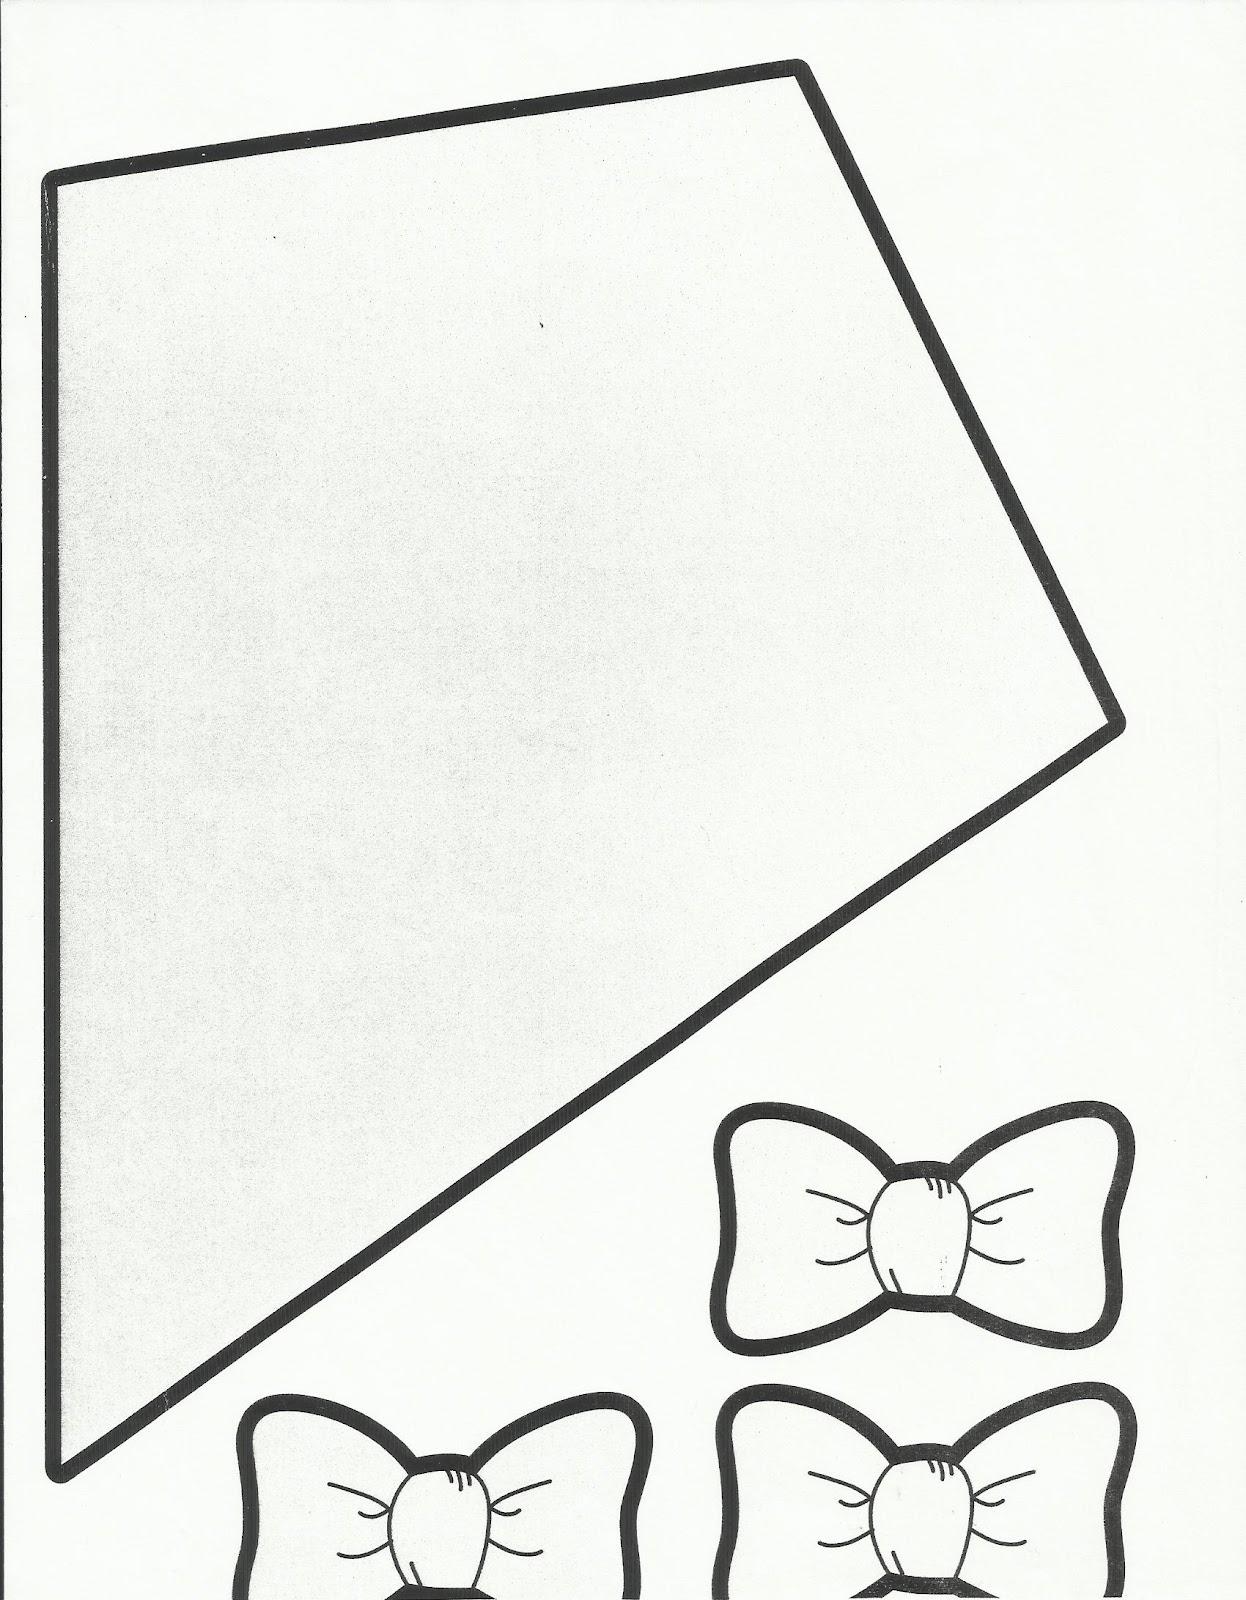 Squares clipart kite #13